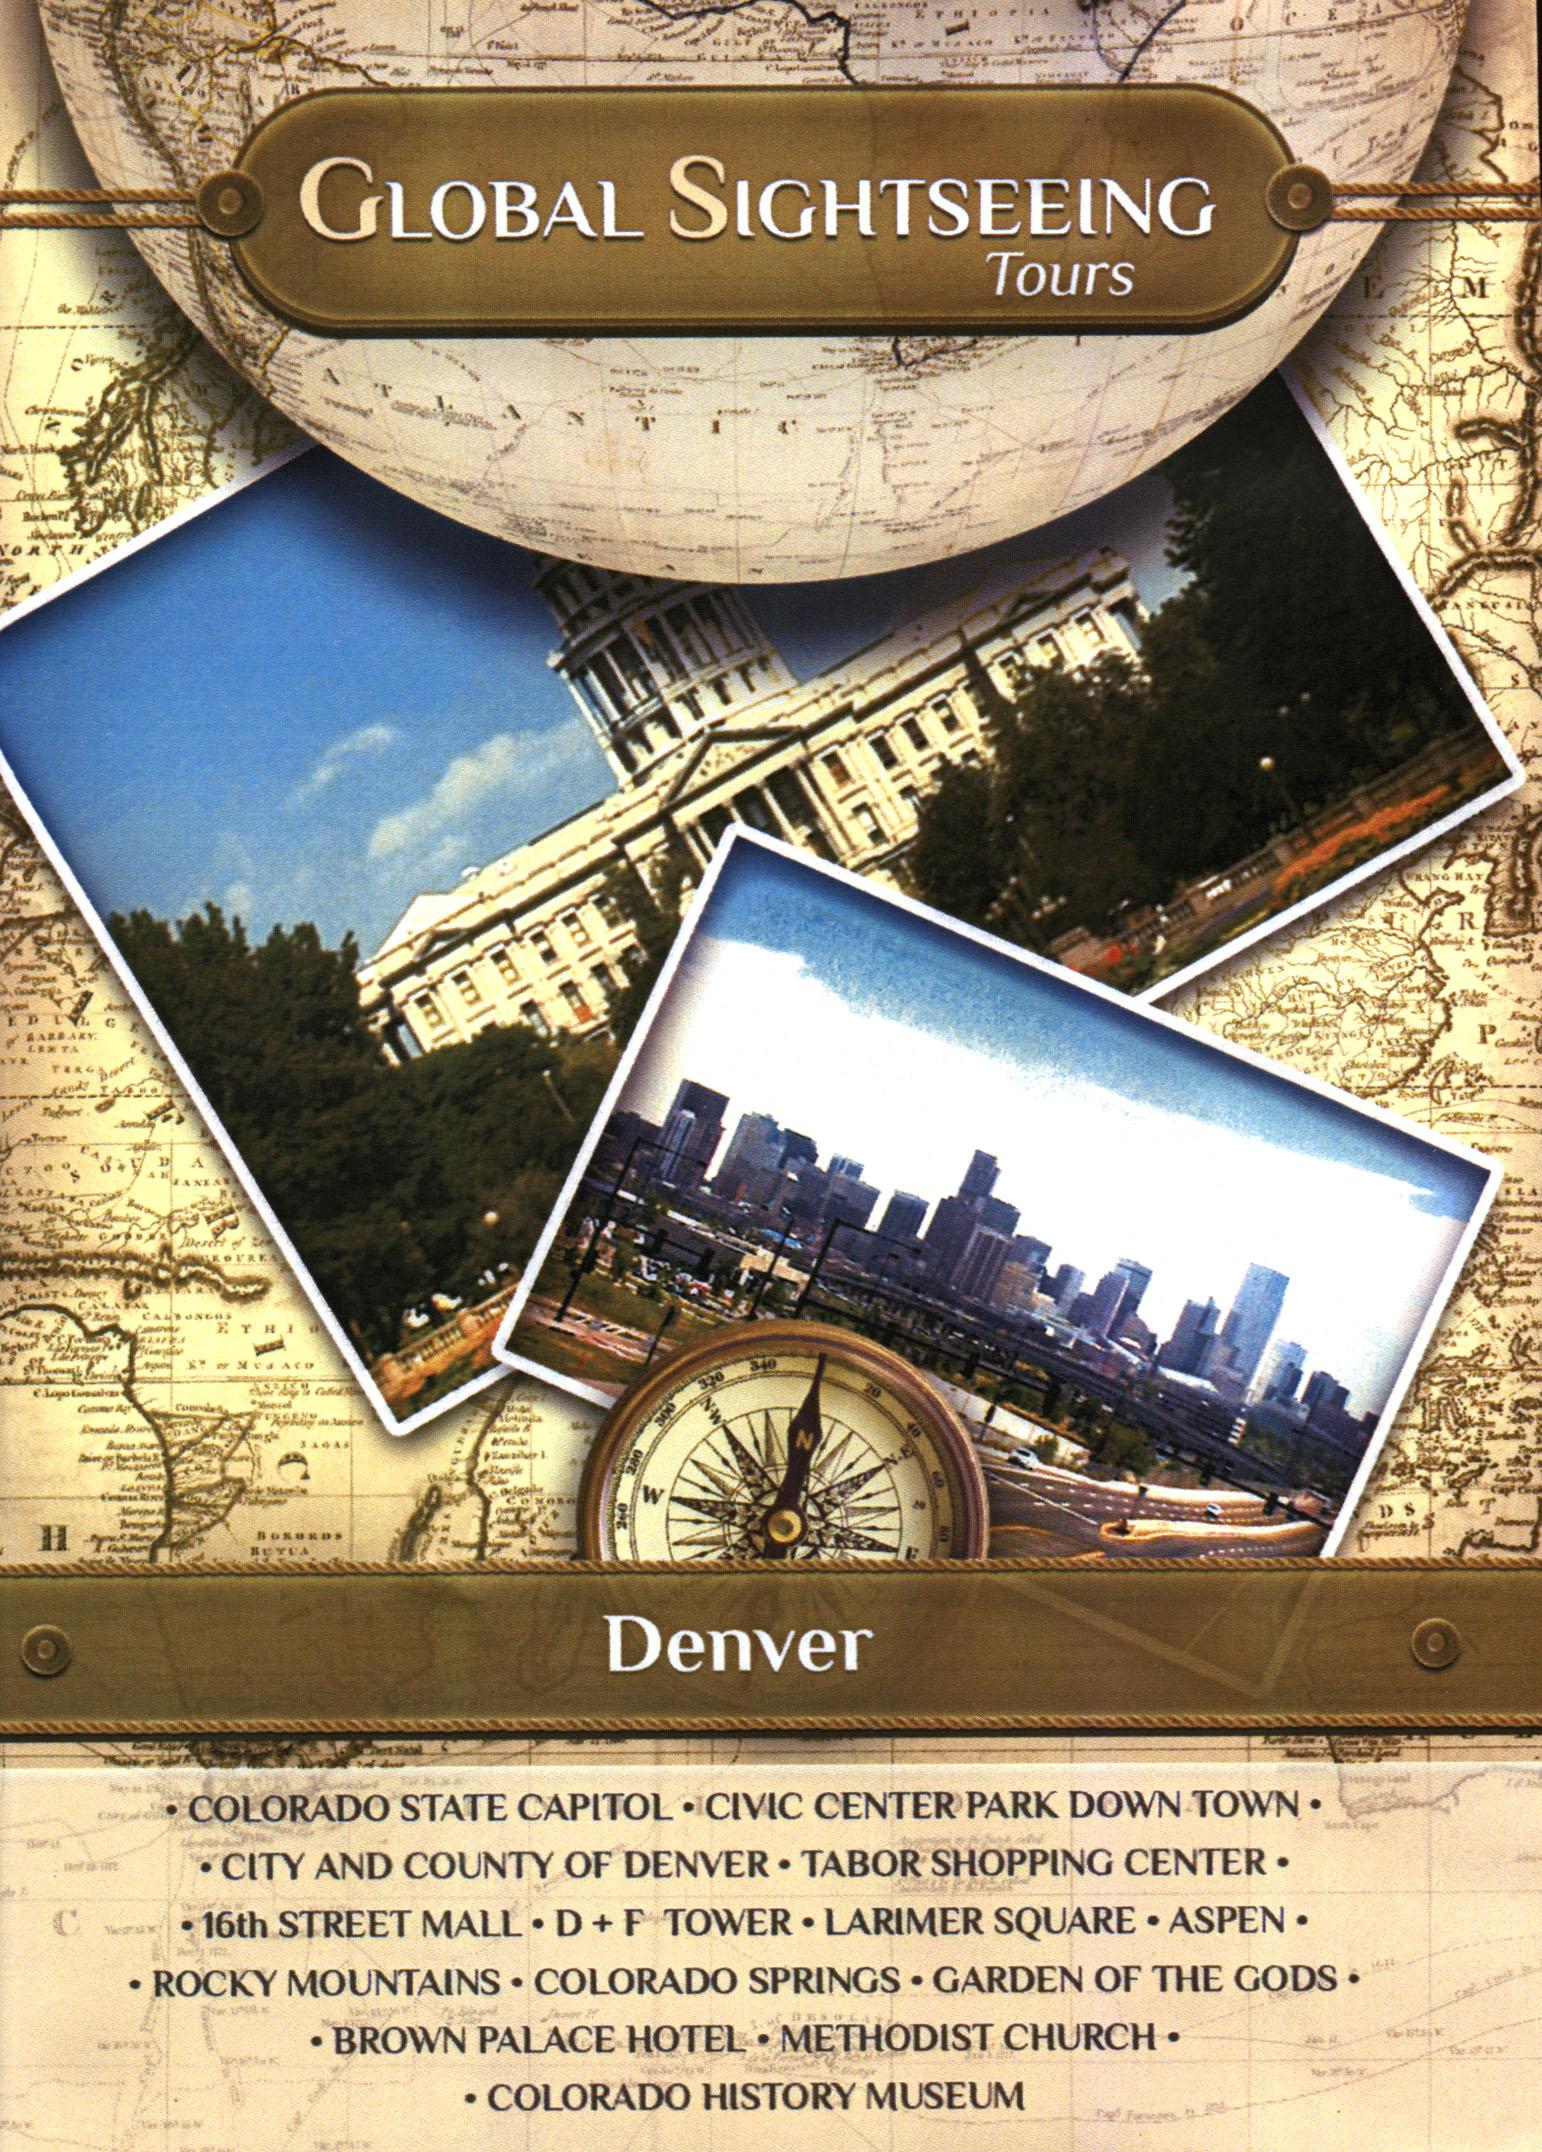 Global Sightseeing Tours: Denver